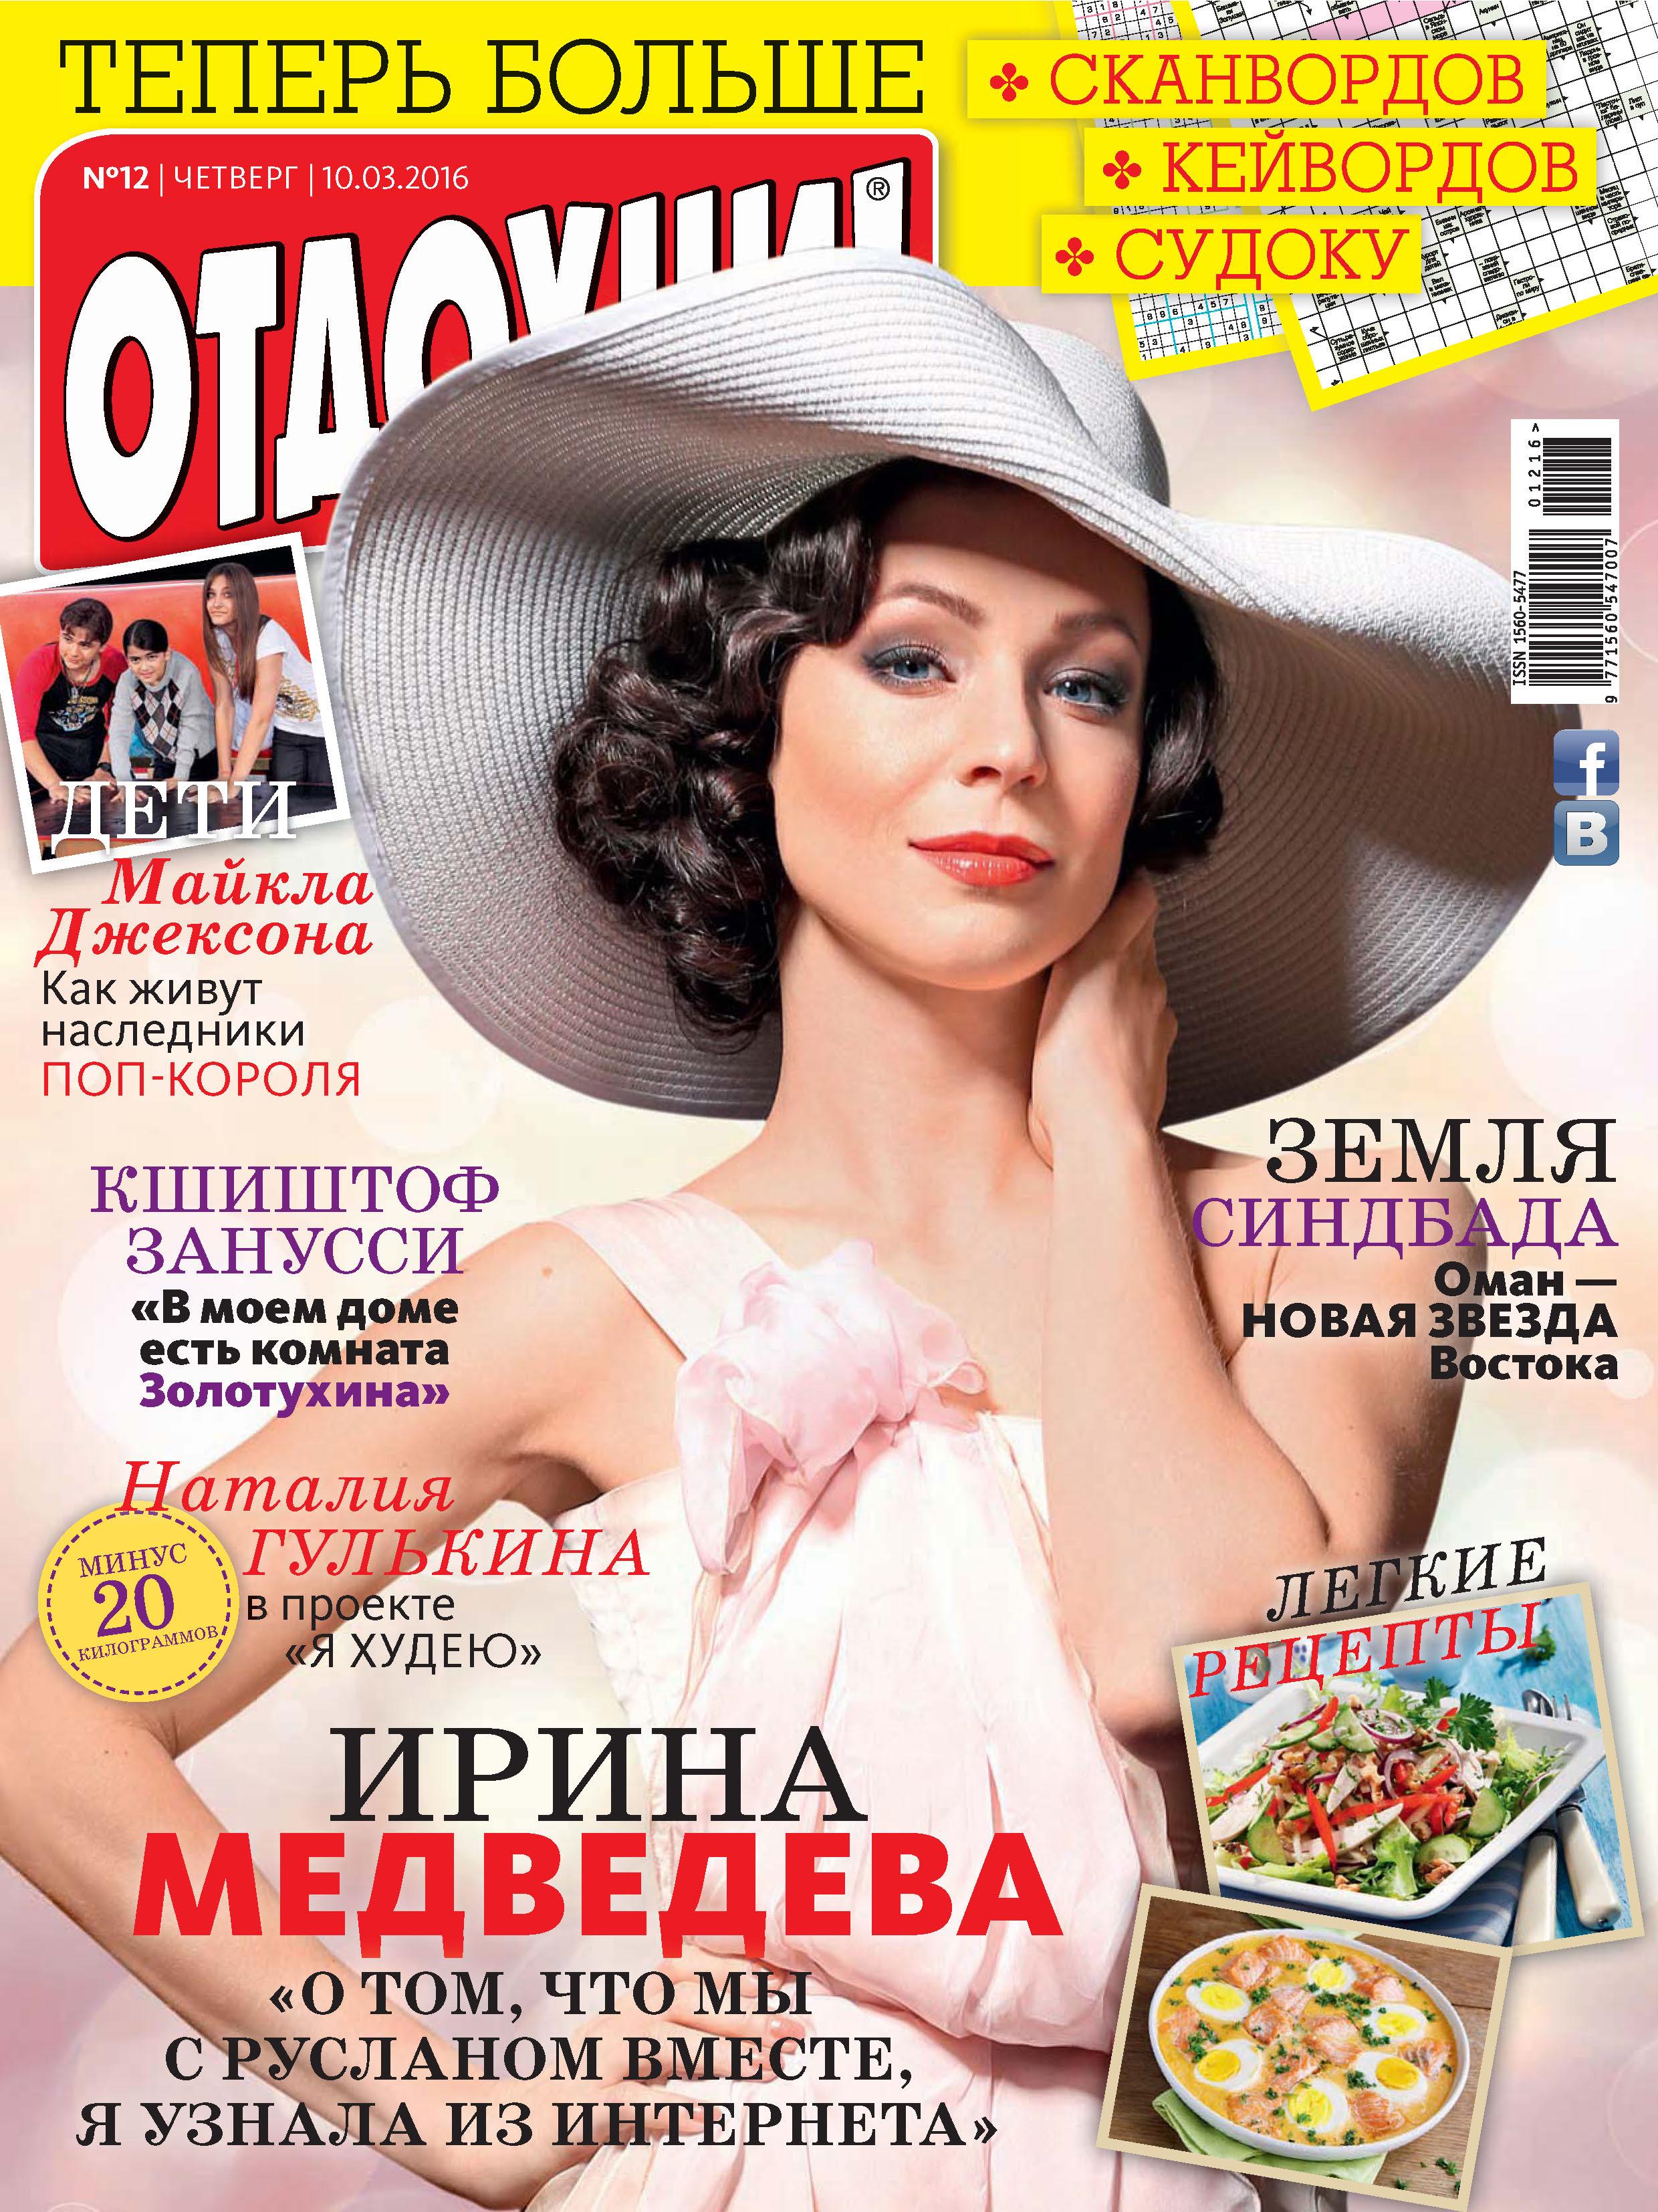 ИД «Бурда» Журнал «Отдохни!» №12/2016 ид бурда журнал отдохни 35 2016